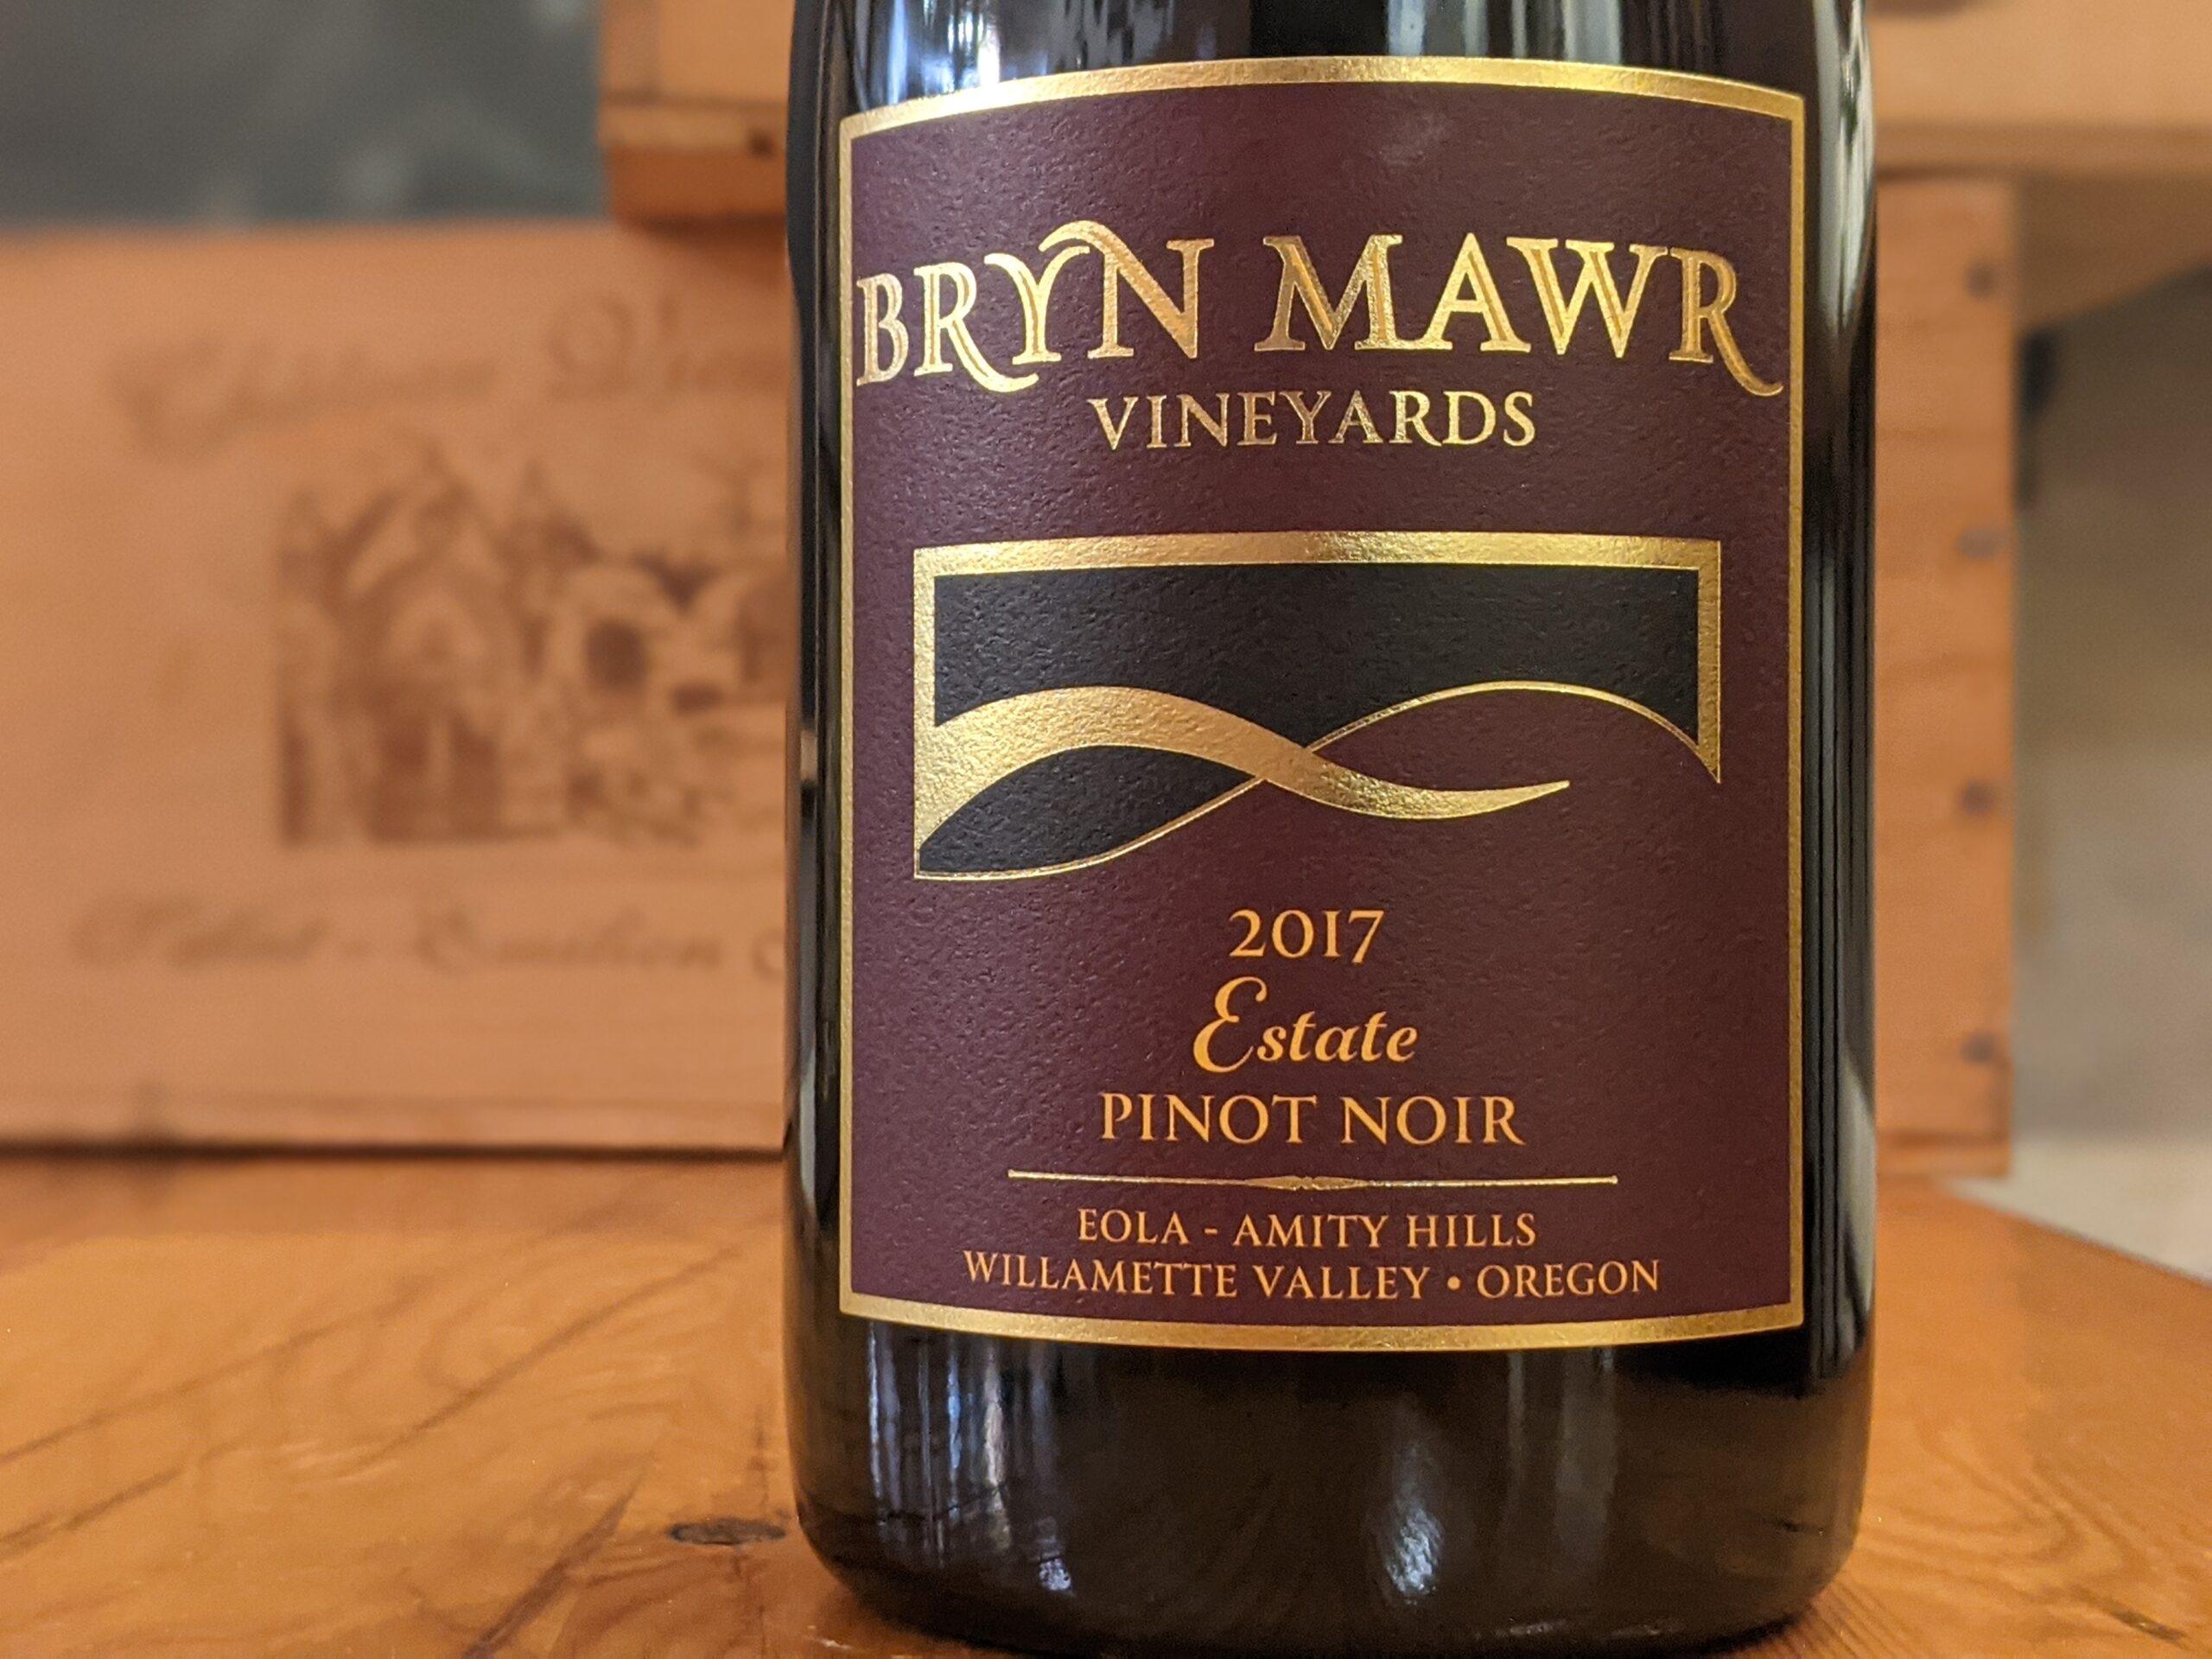 Bryn Mawr Vineyards 2017 Estate Pinot Noir, Eola Amity Hills